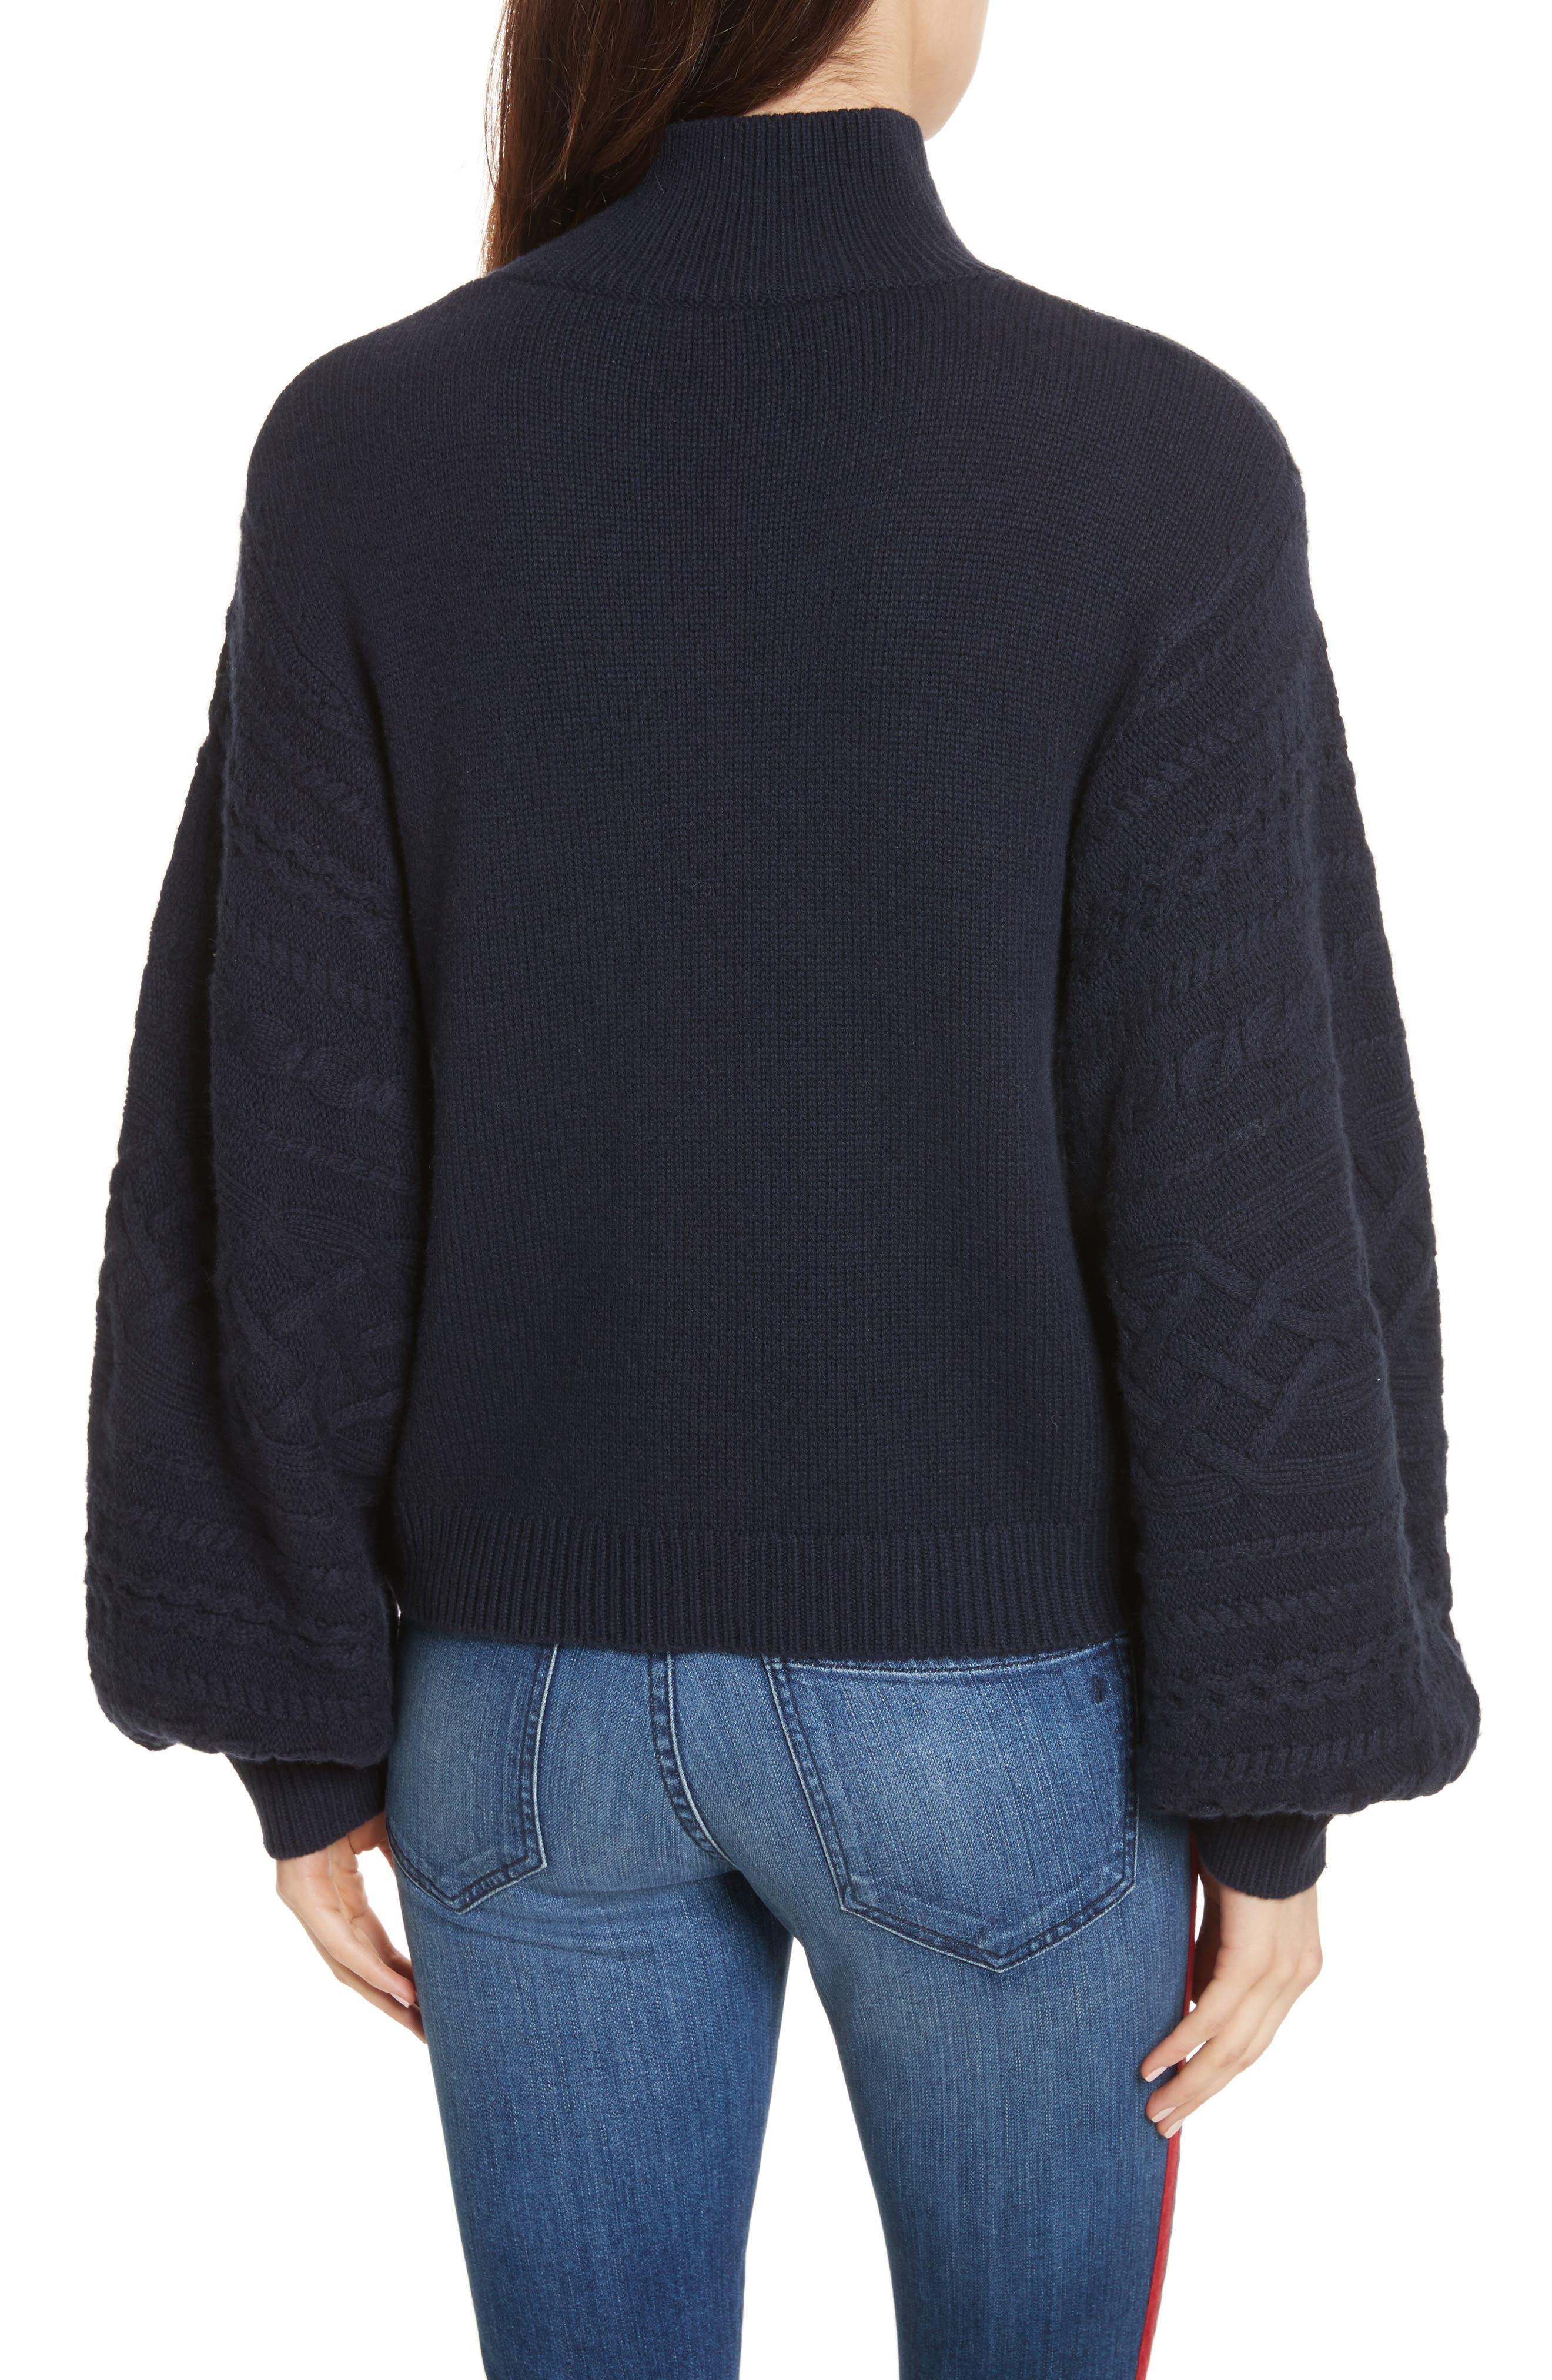 Lathen Mock Neck Sweater,                             Alternate thumbnail 2, color,                             Midnight